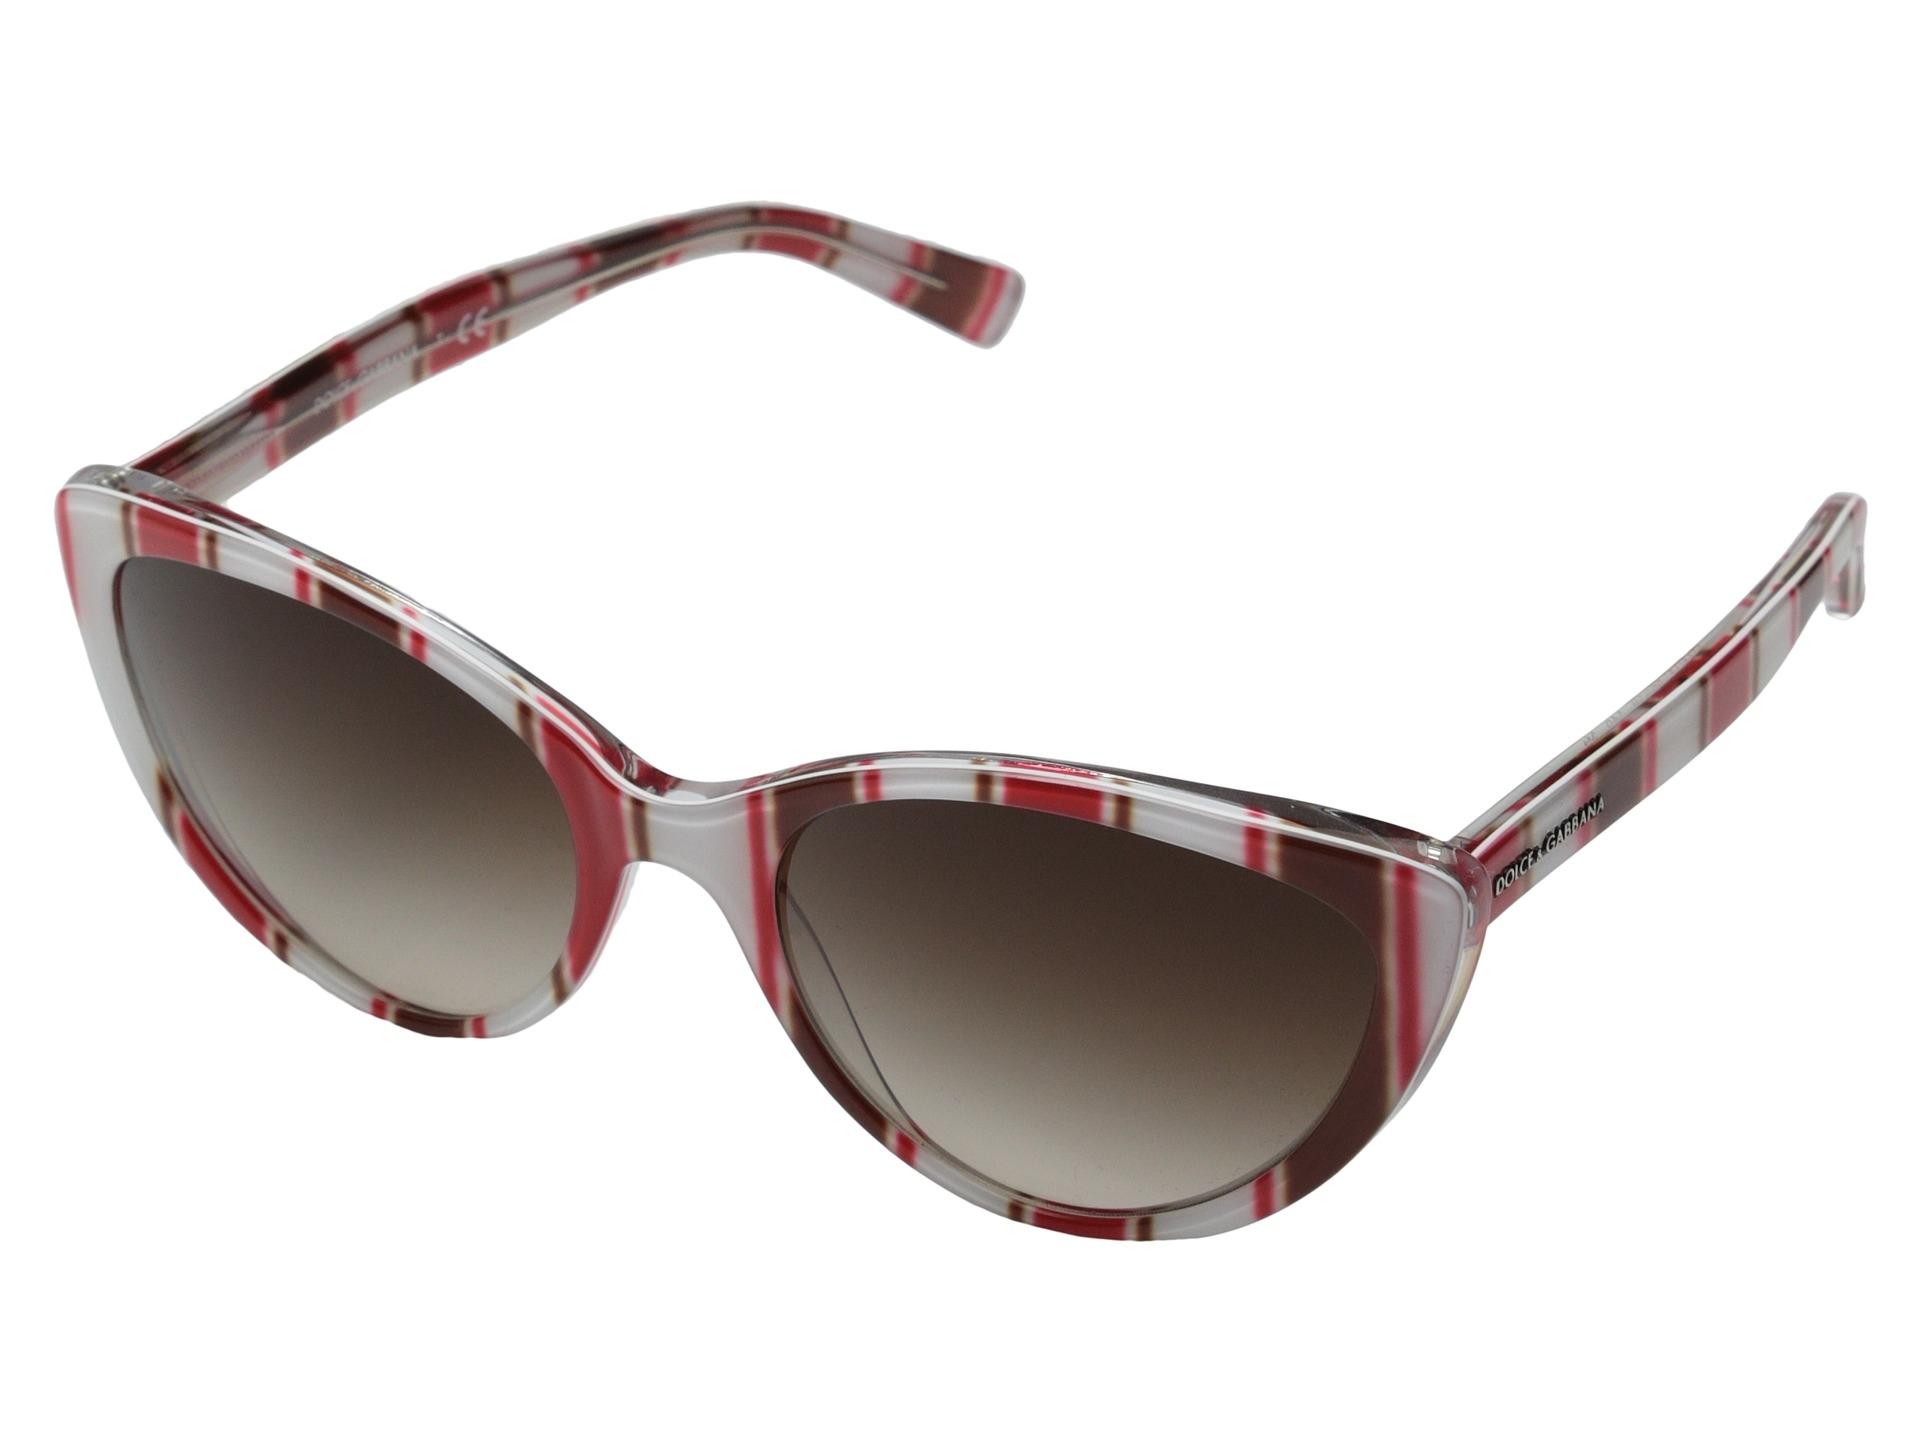 4cc1a70d0b41 Solbriller Til Gabbana Dg896503 Kvinder Dolceamp  HDeIYE2W9